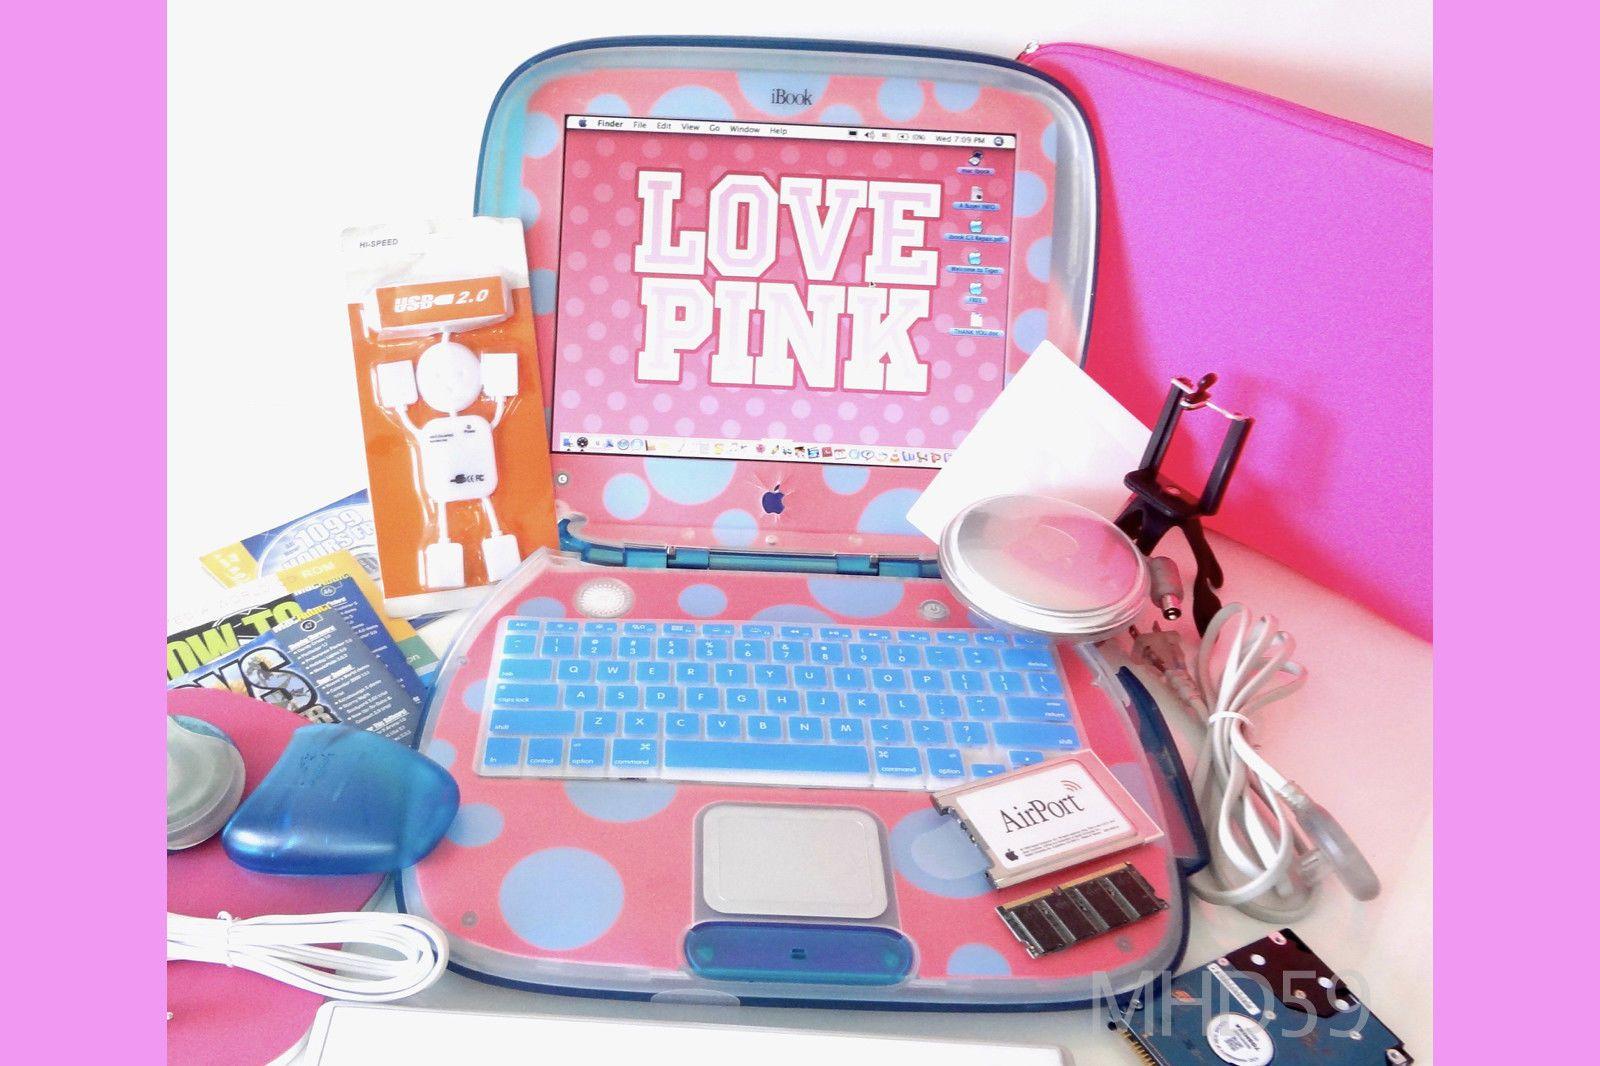 Macbook Screen Pink Tint